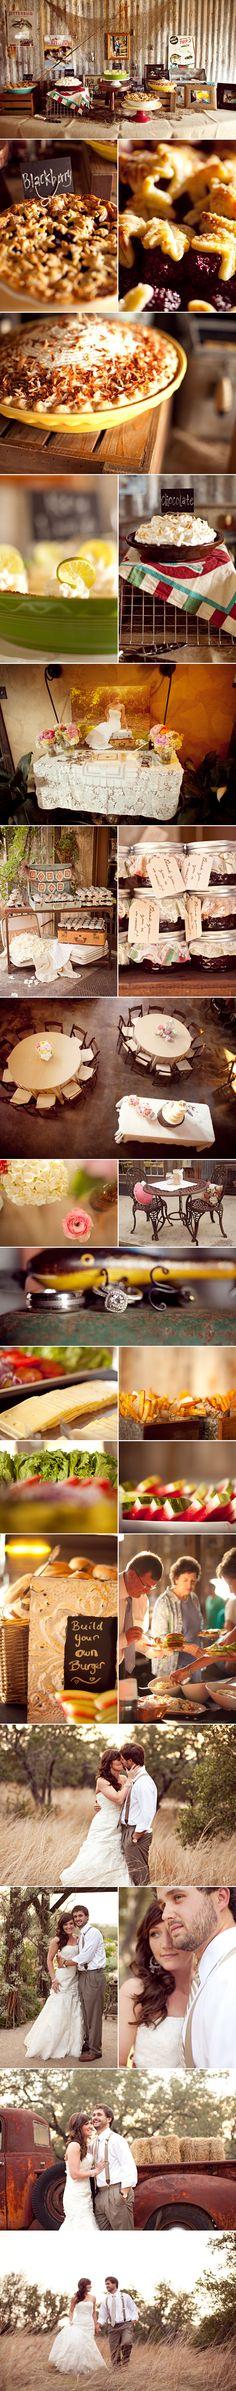 Vista West Ranch - Amazing decorating ideas! Amazing pictures! Just Amazing!